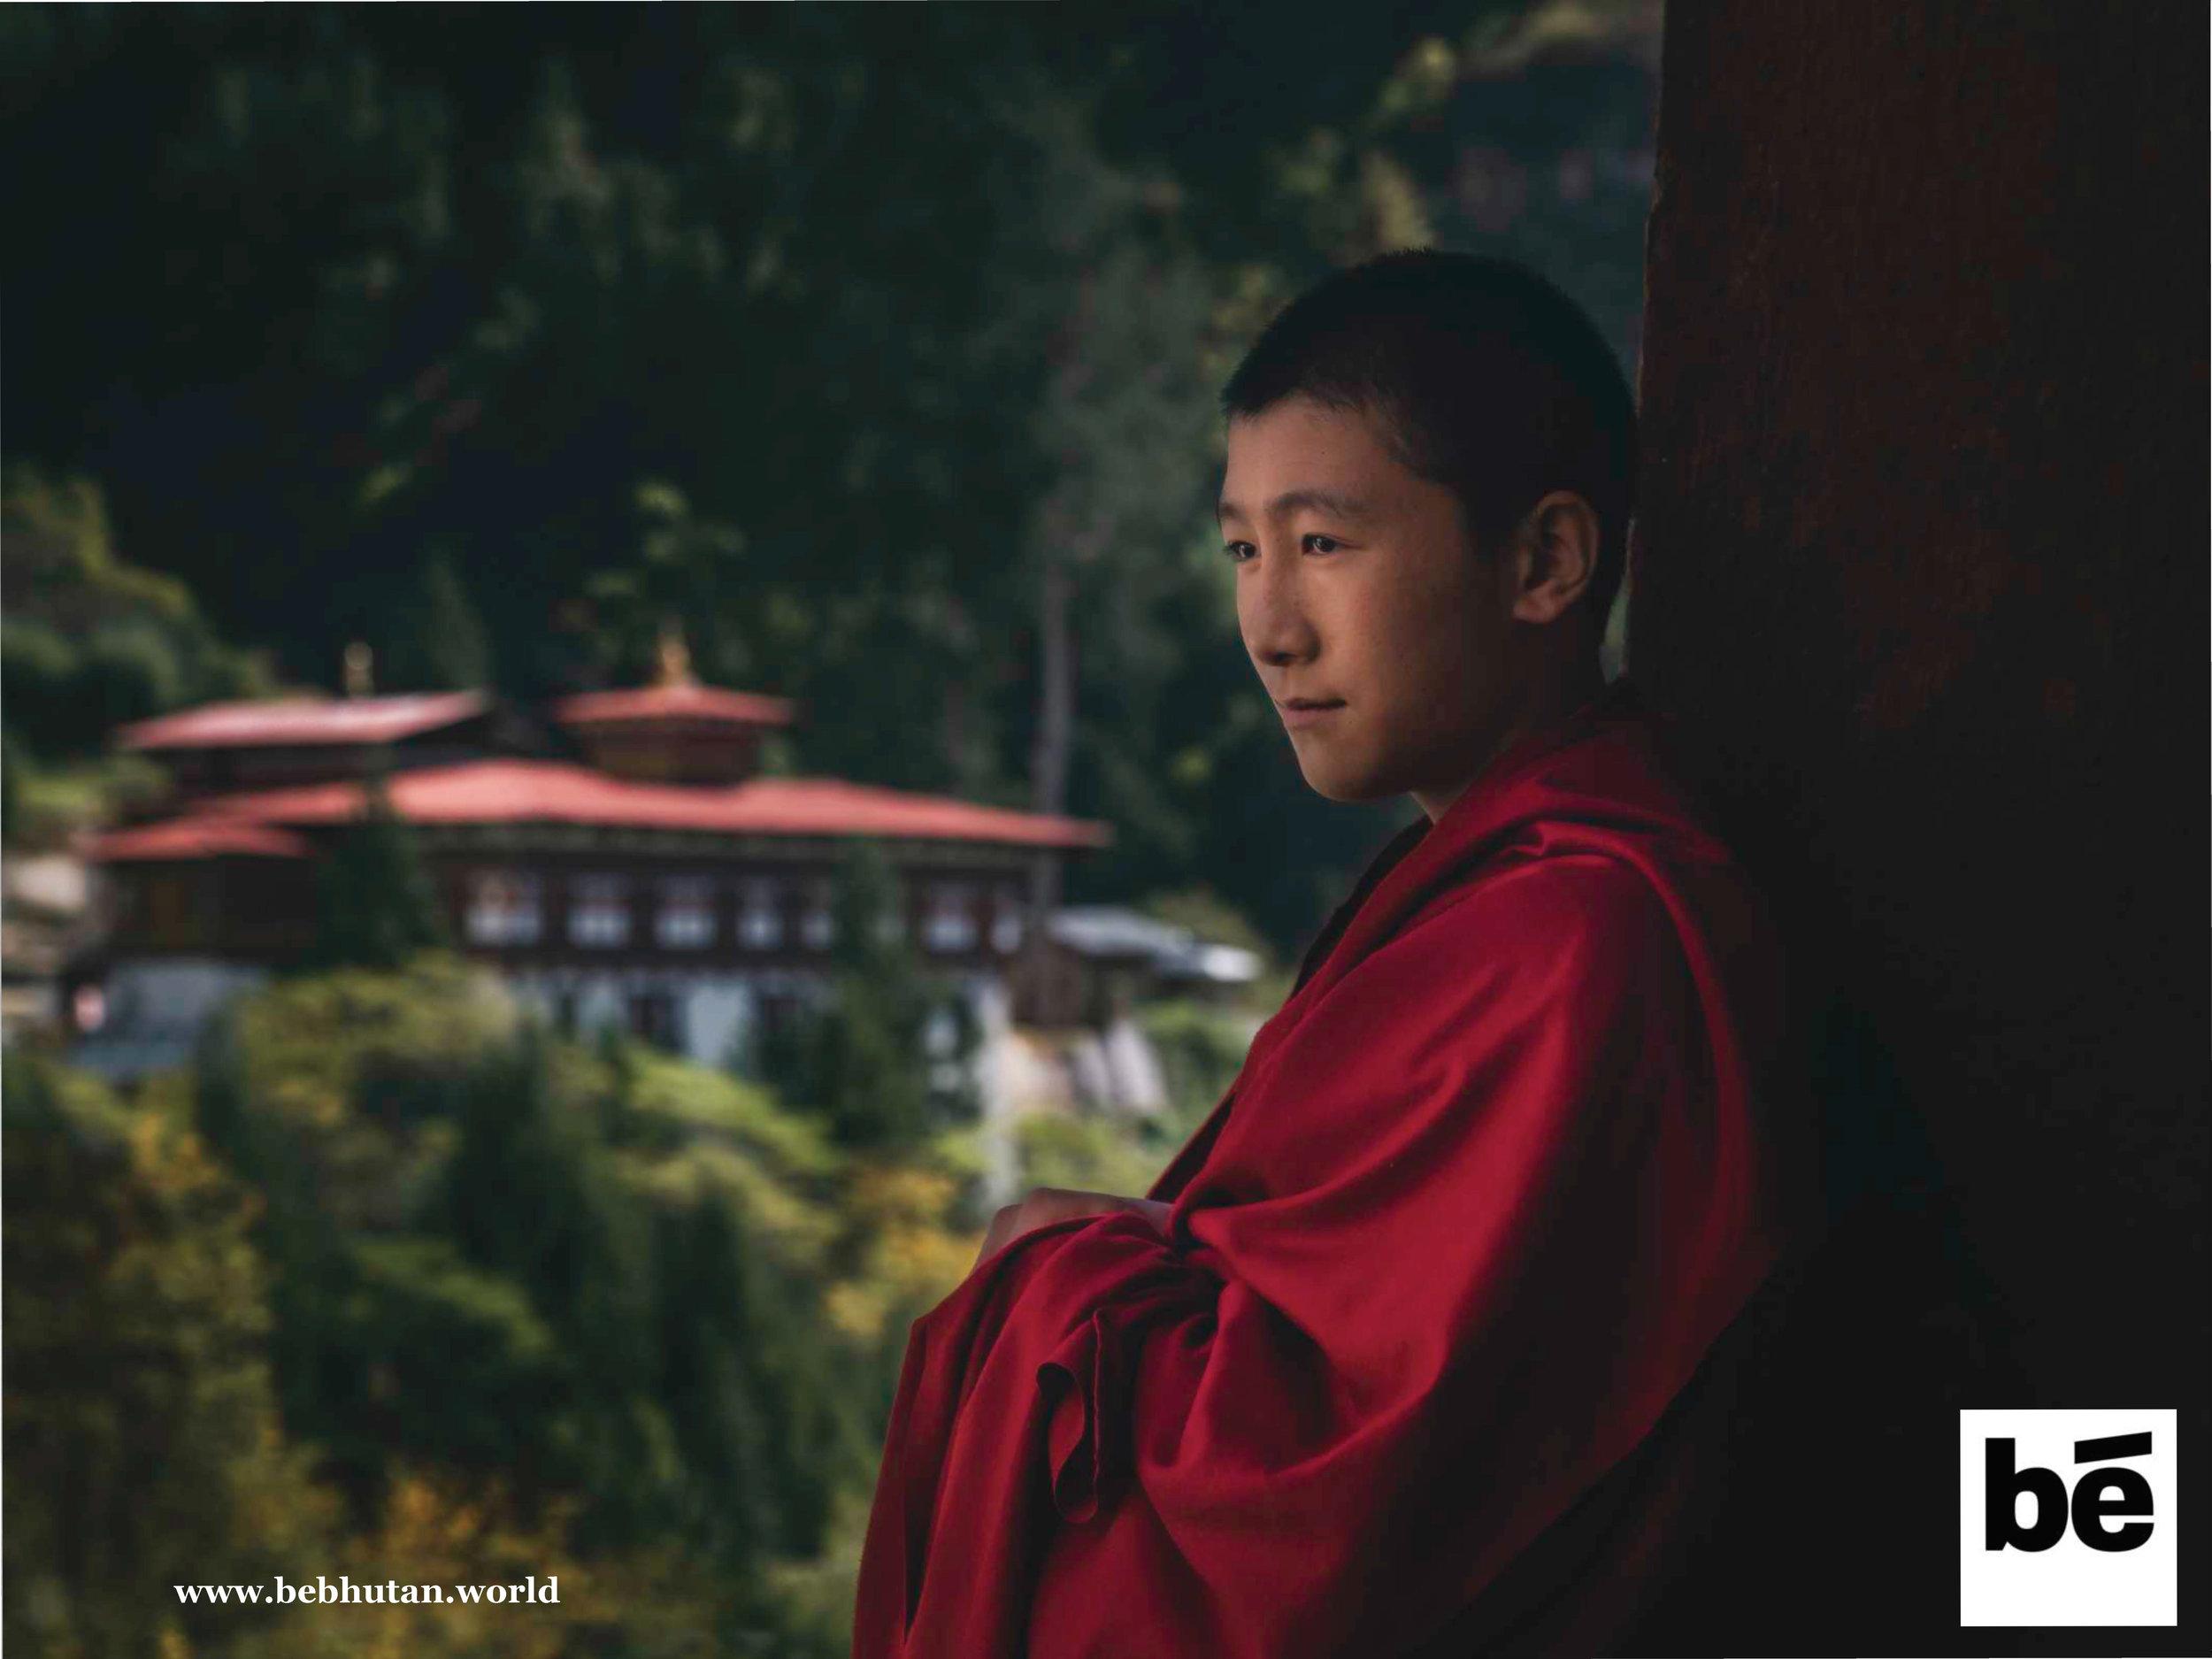 Bé_Bhutan_Page_31.jpg